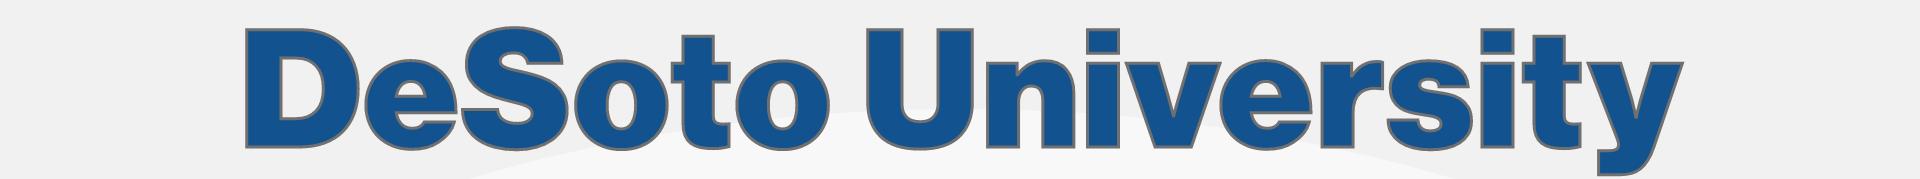 DeSoto University Spelled